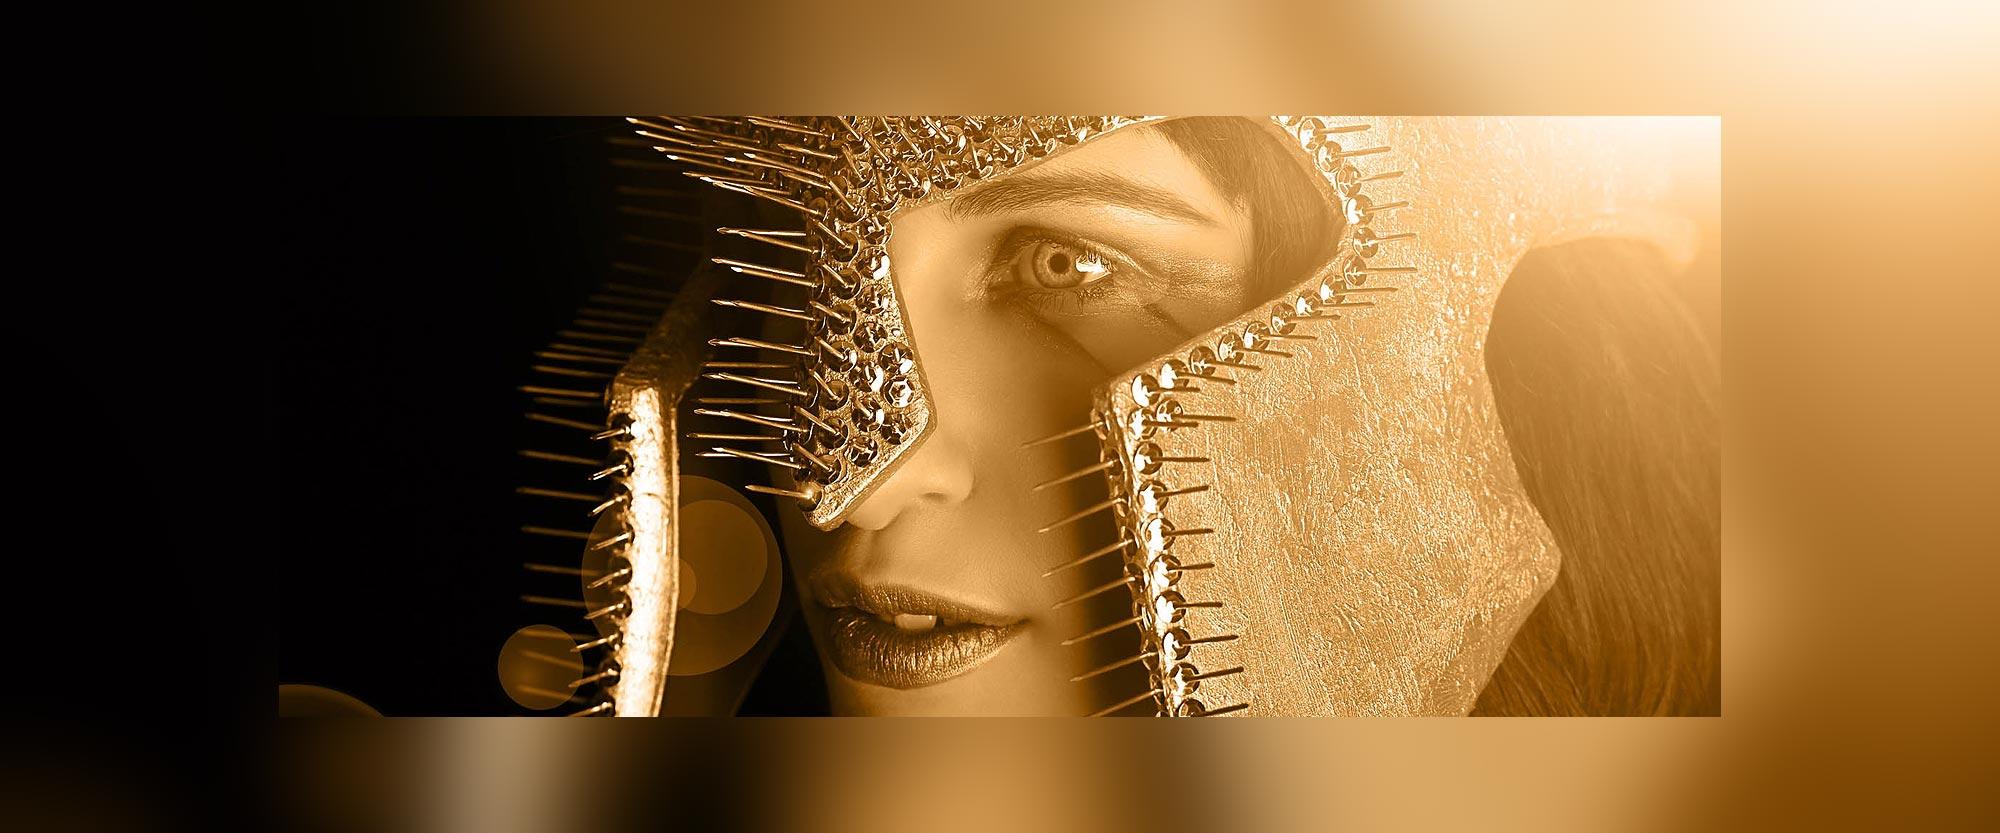 stiefenhofer-design-profi-fotografie-photography